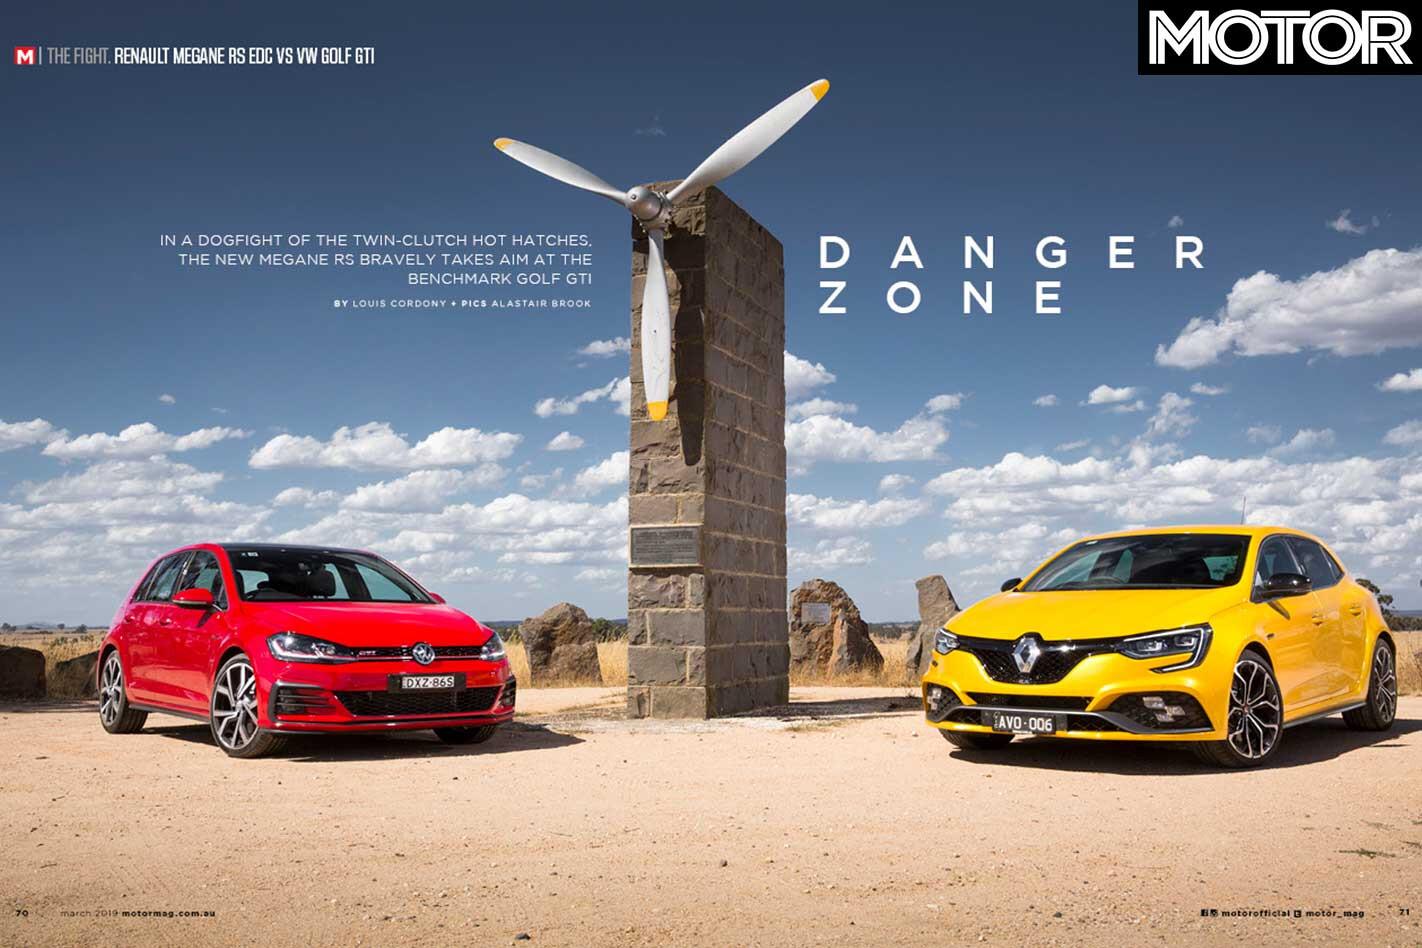 MOTOR Magazine March 2019 Issue Renault Megane Rs Volkswagen Golf Gti Jpg